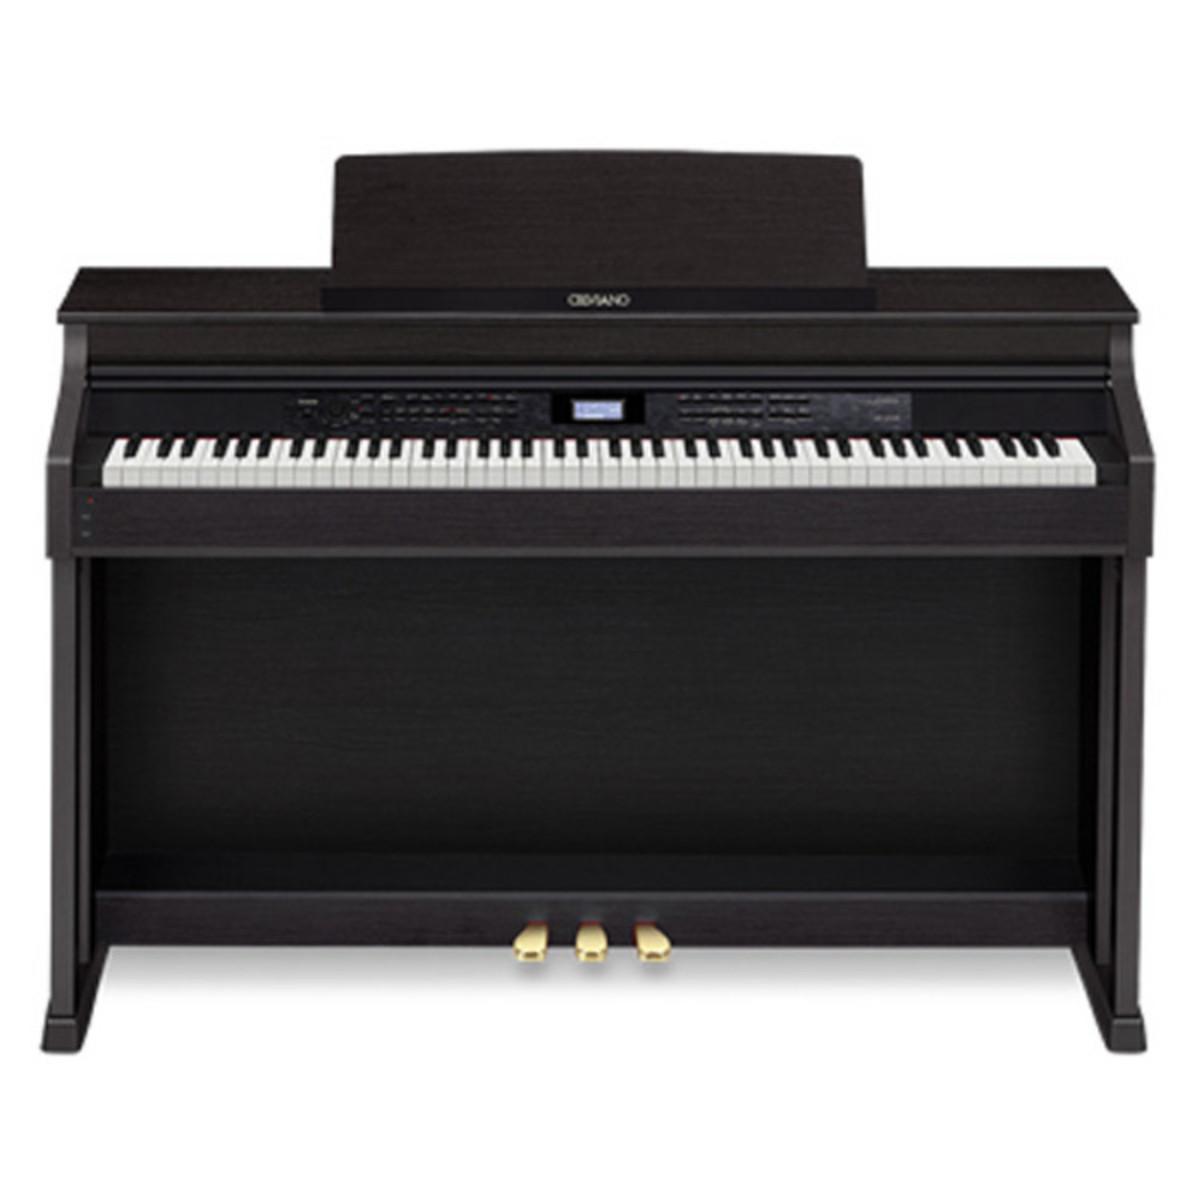 Image of Casio Celviano AP-650 Digital Piano